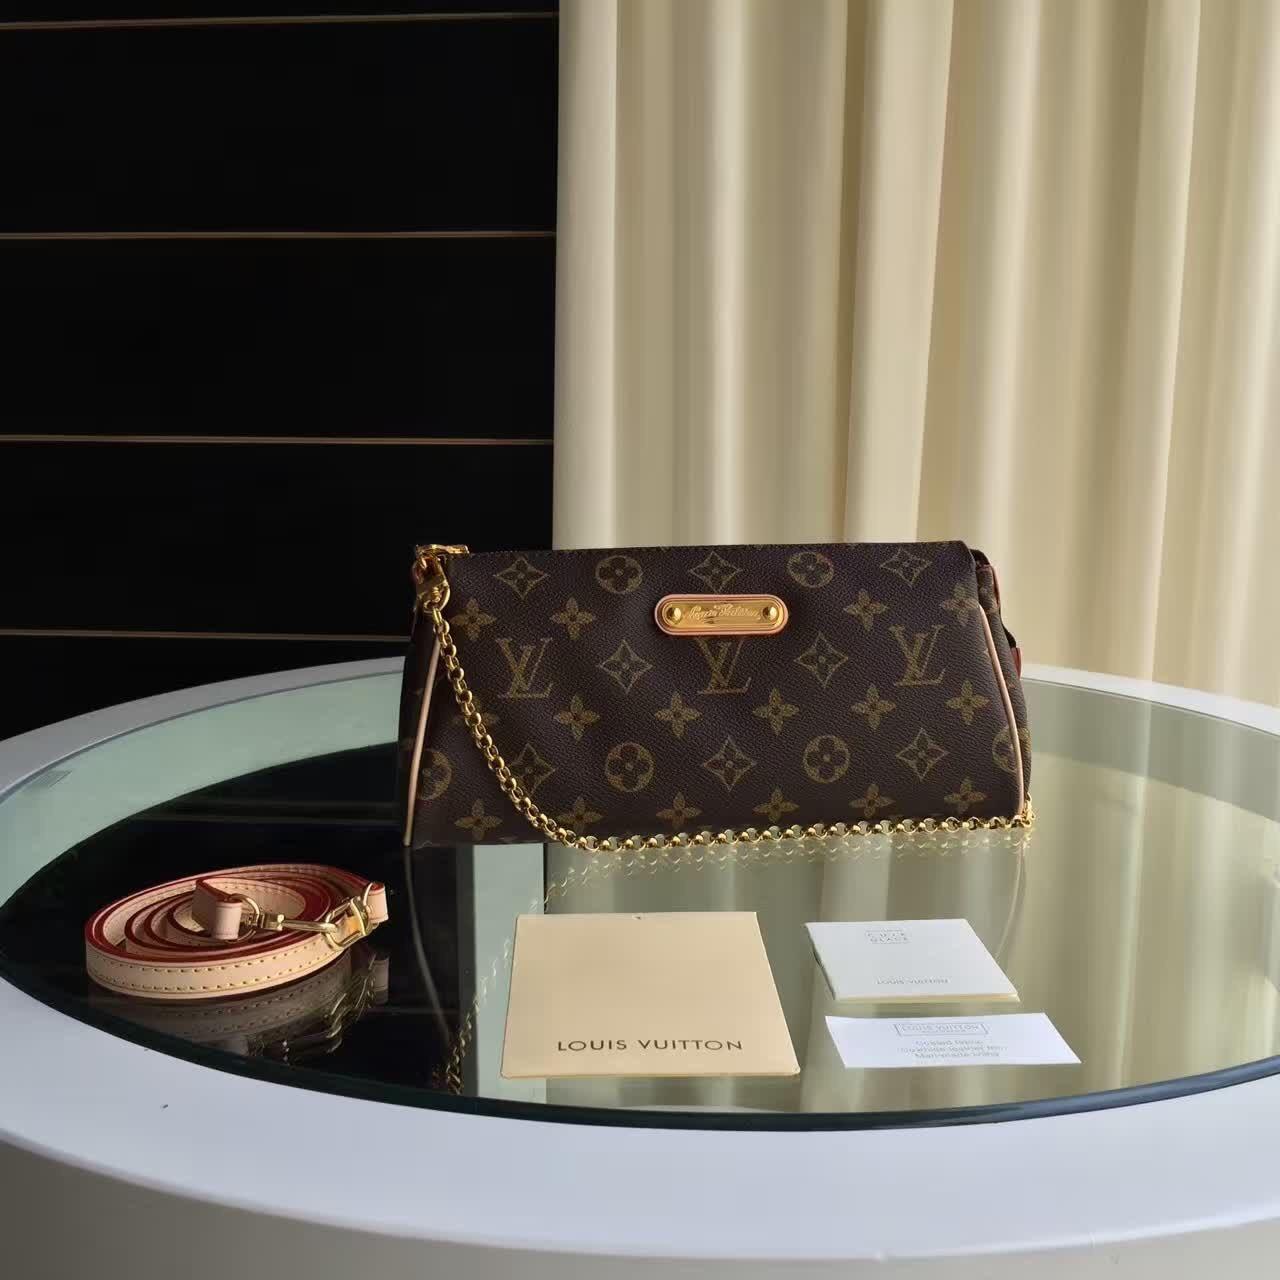 0522ccaf0906 Женская сумка Louis Vuitton Eva Monogram Canvas, цена 4 200 грн ...